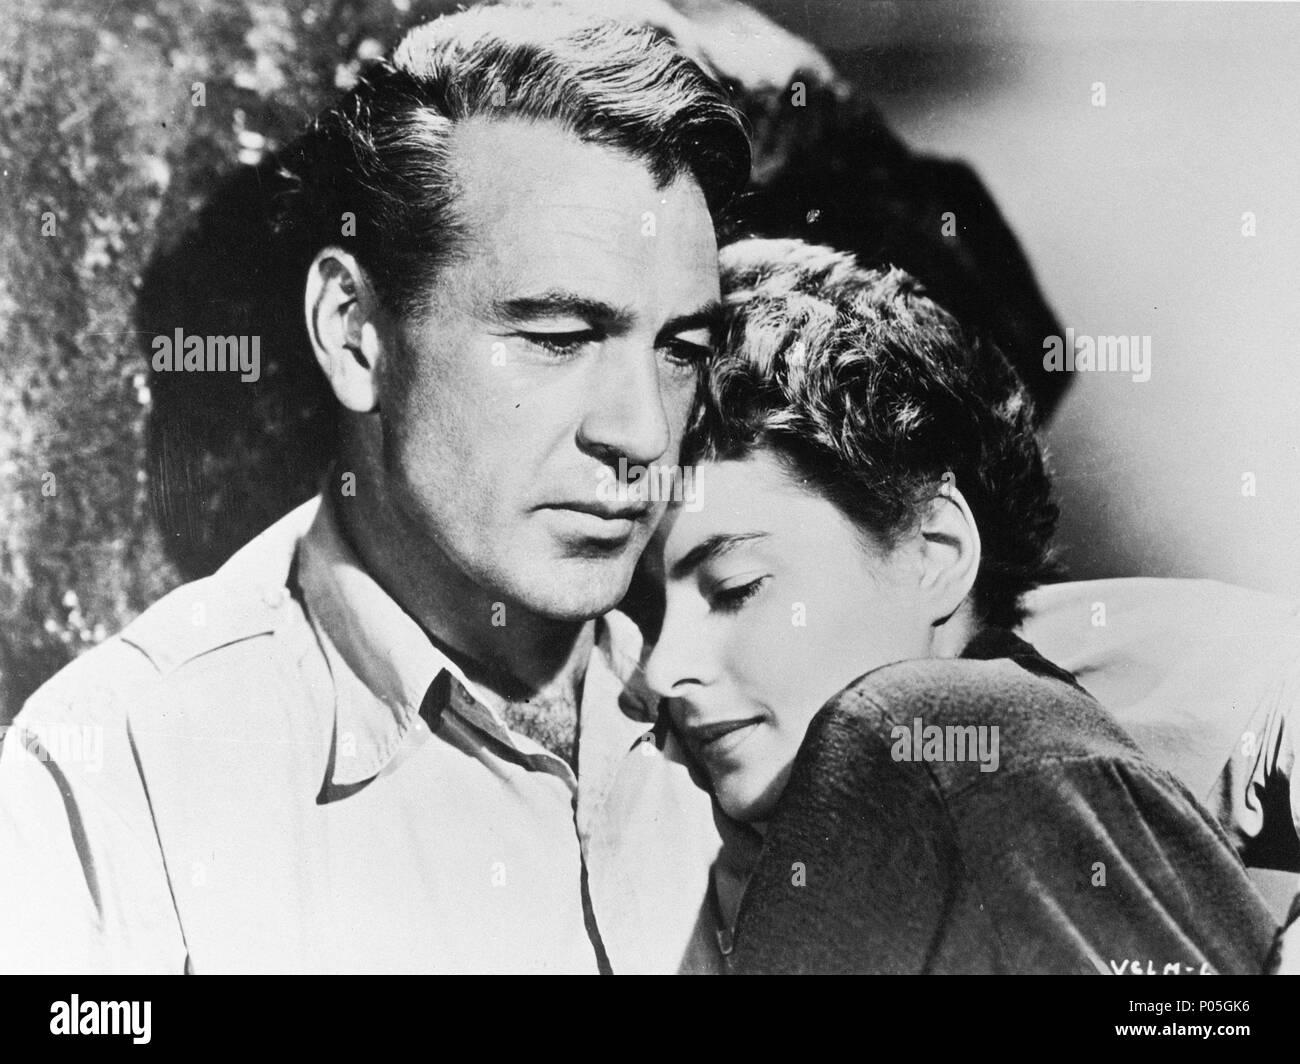 Original Film Title: FOR WHOM THE BELL TOLLS.  English Title: FOR WHOM THE BELL TOLLS.  Film Director: SAM WOOD.  Year: 1943.  Stars: GARY COOPER; INGRID BERGMAN. Credit: PARAMOUNT PICTURES / Album - Stock Image